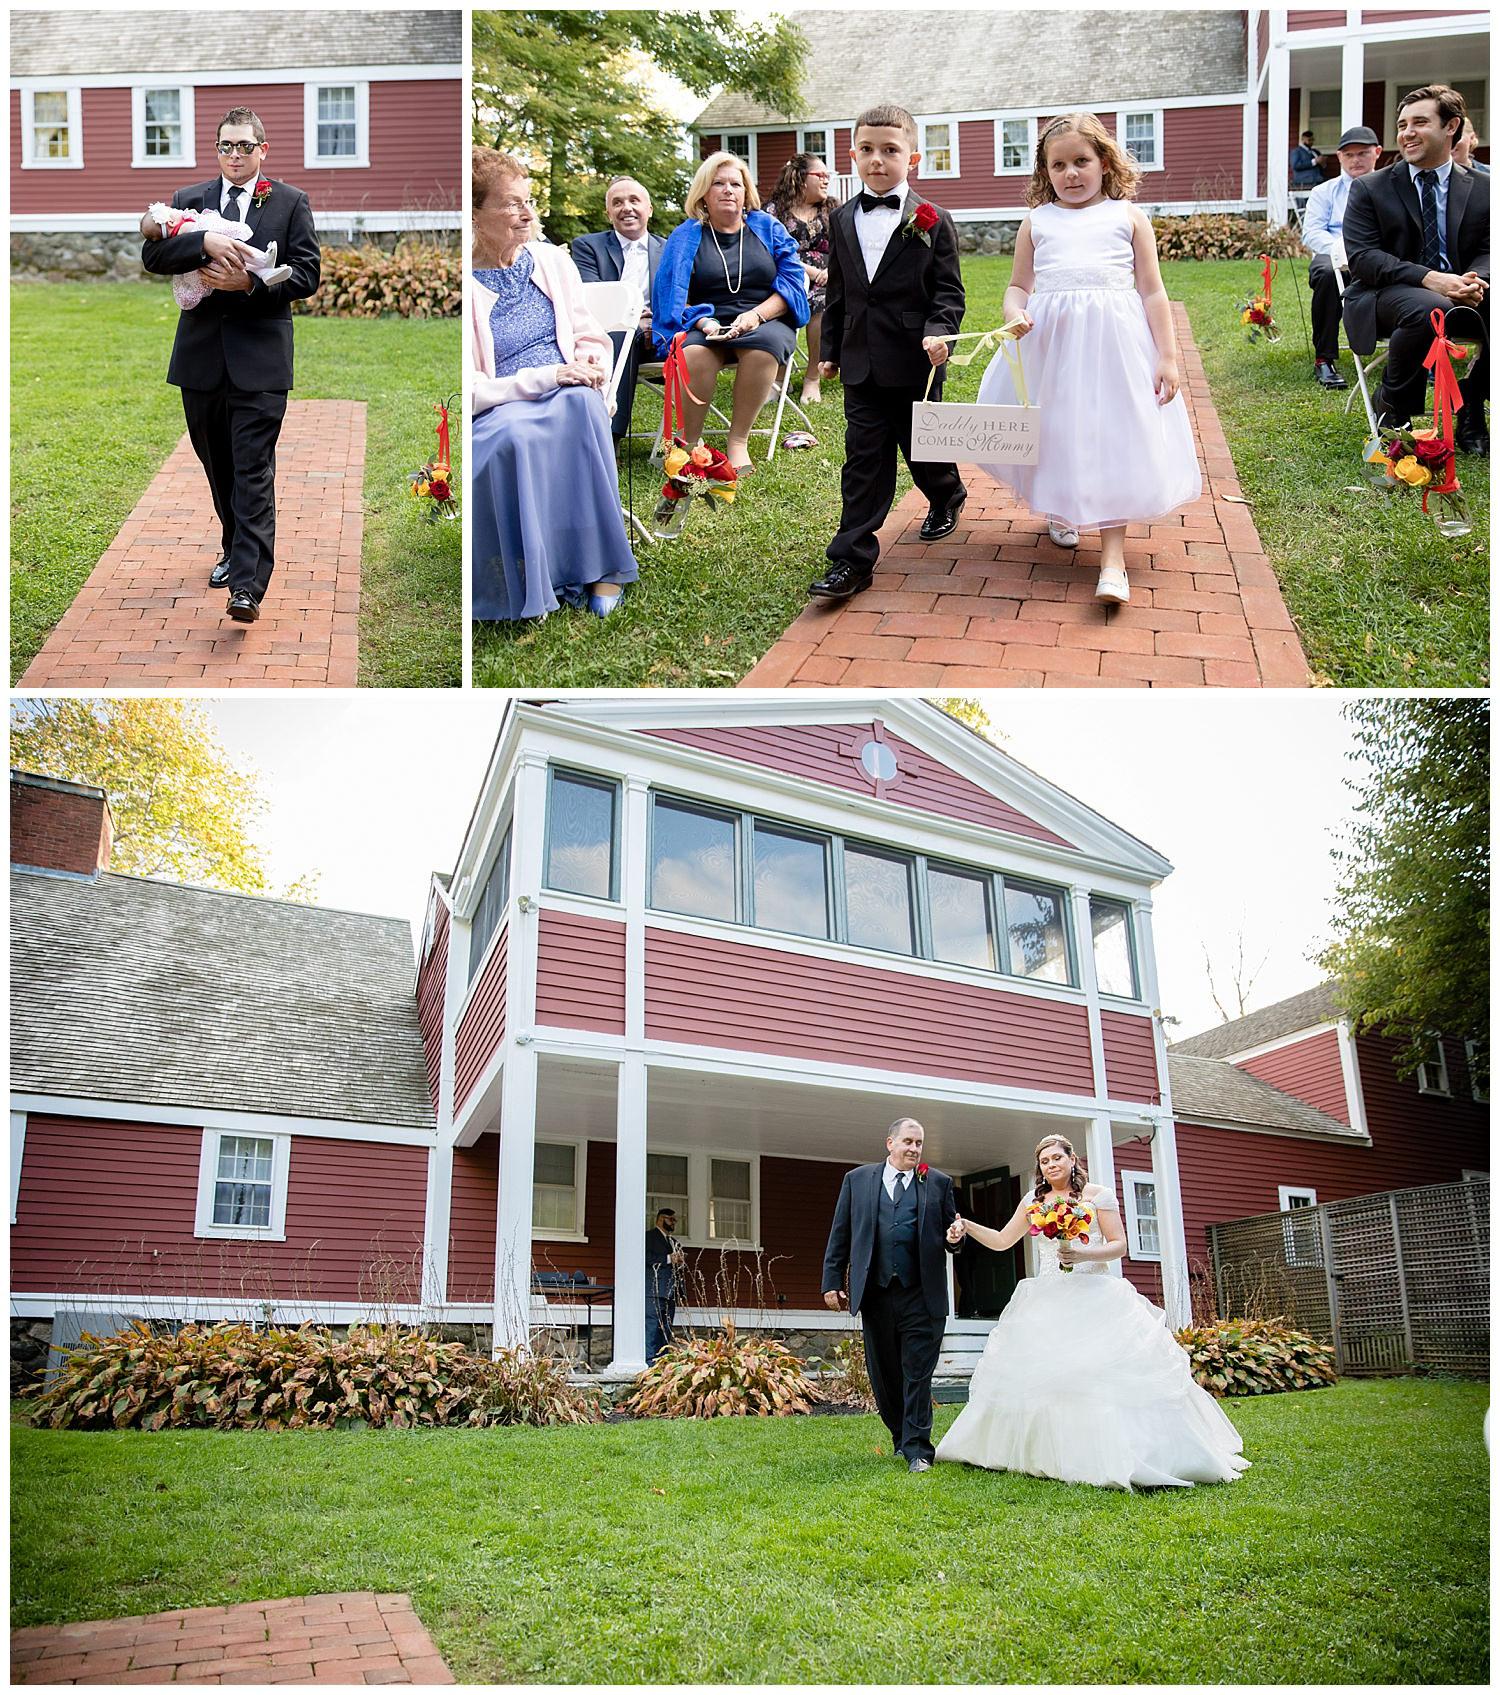 smith-barn-brooksby-farm-wedding-26-north-studios-boston-wedding-photographer-018.jpg